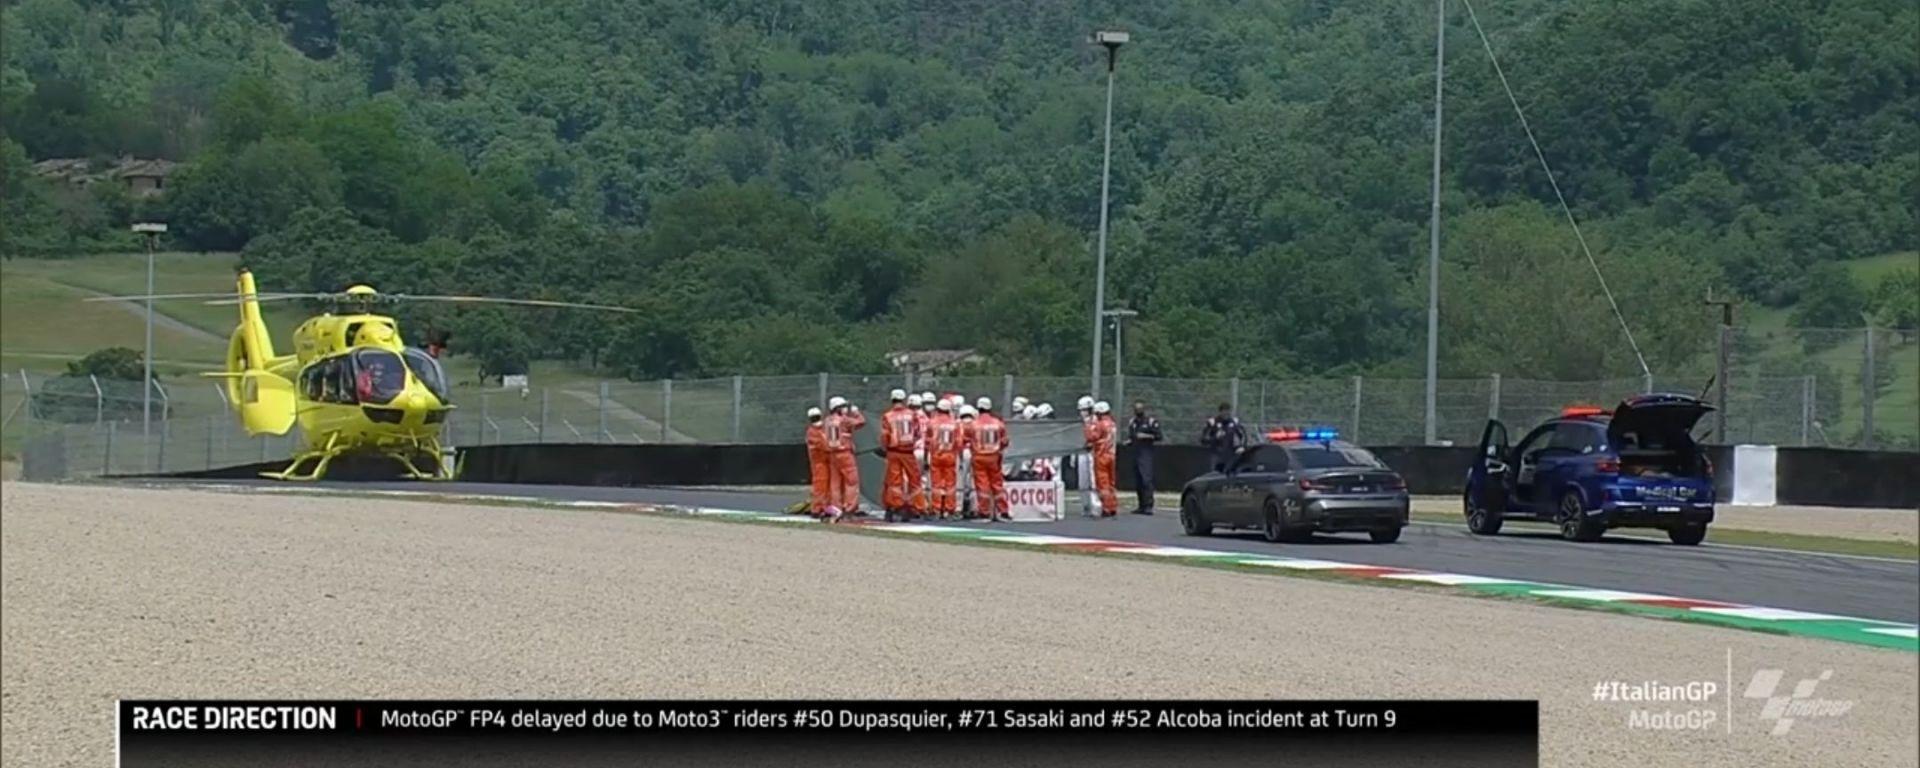 Moto3, GP Italia 2021: i soccorsi a Dupasquier